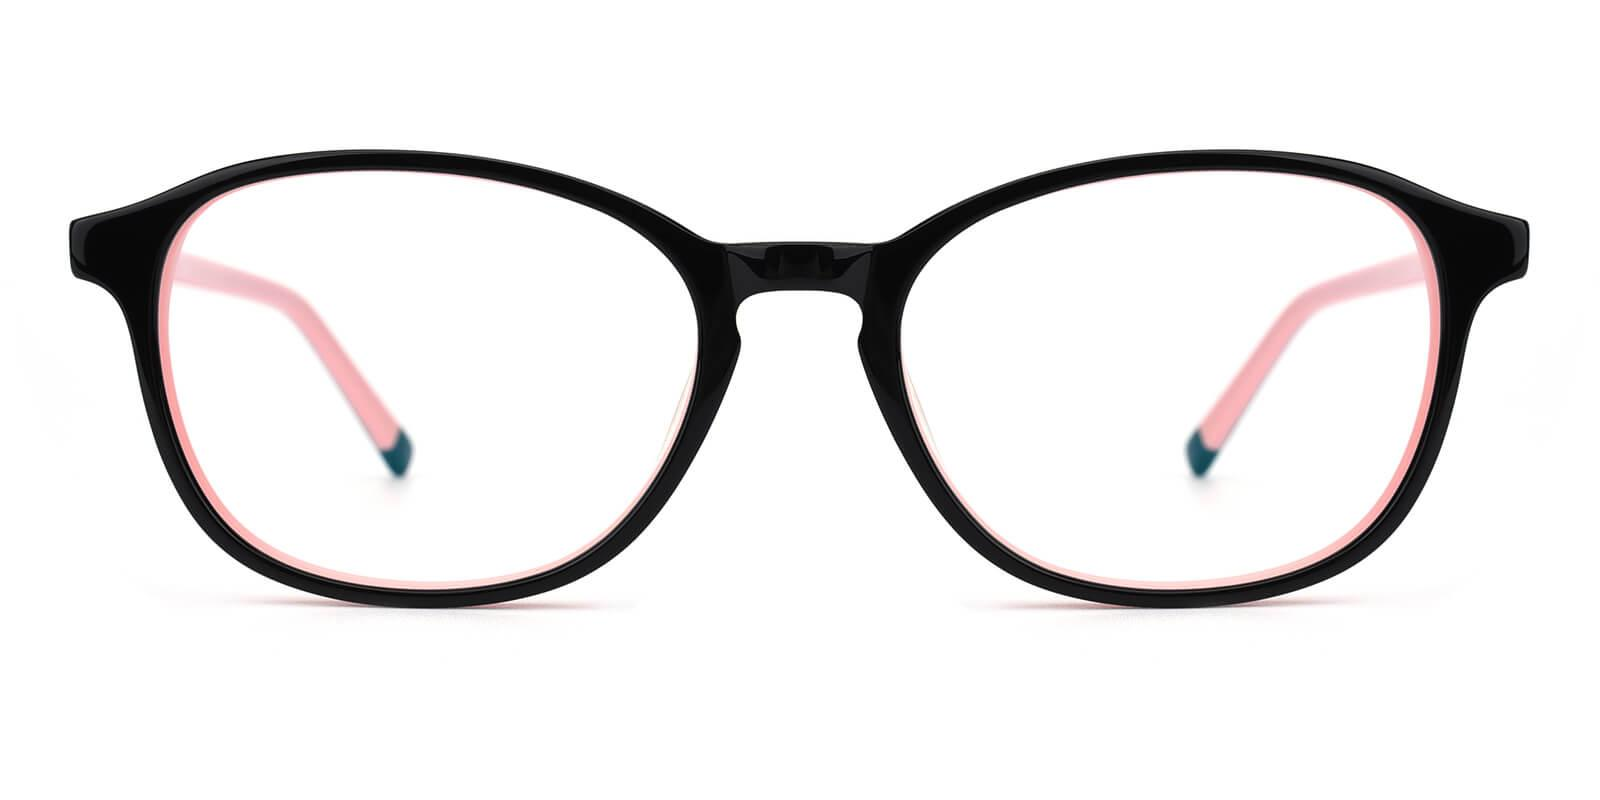 Lisbon-Pink-Square-Acetate-Eyeglasses-detail